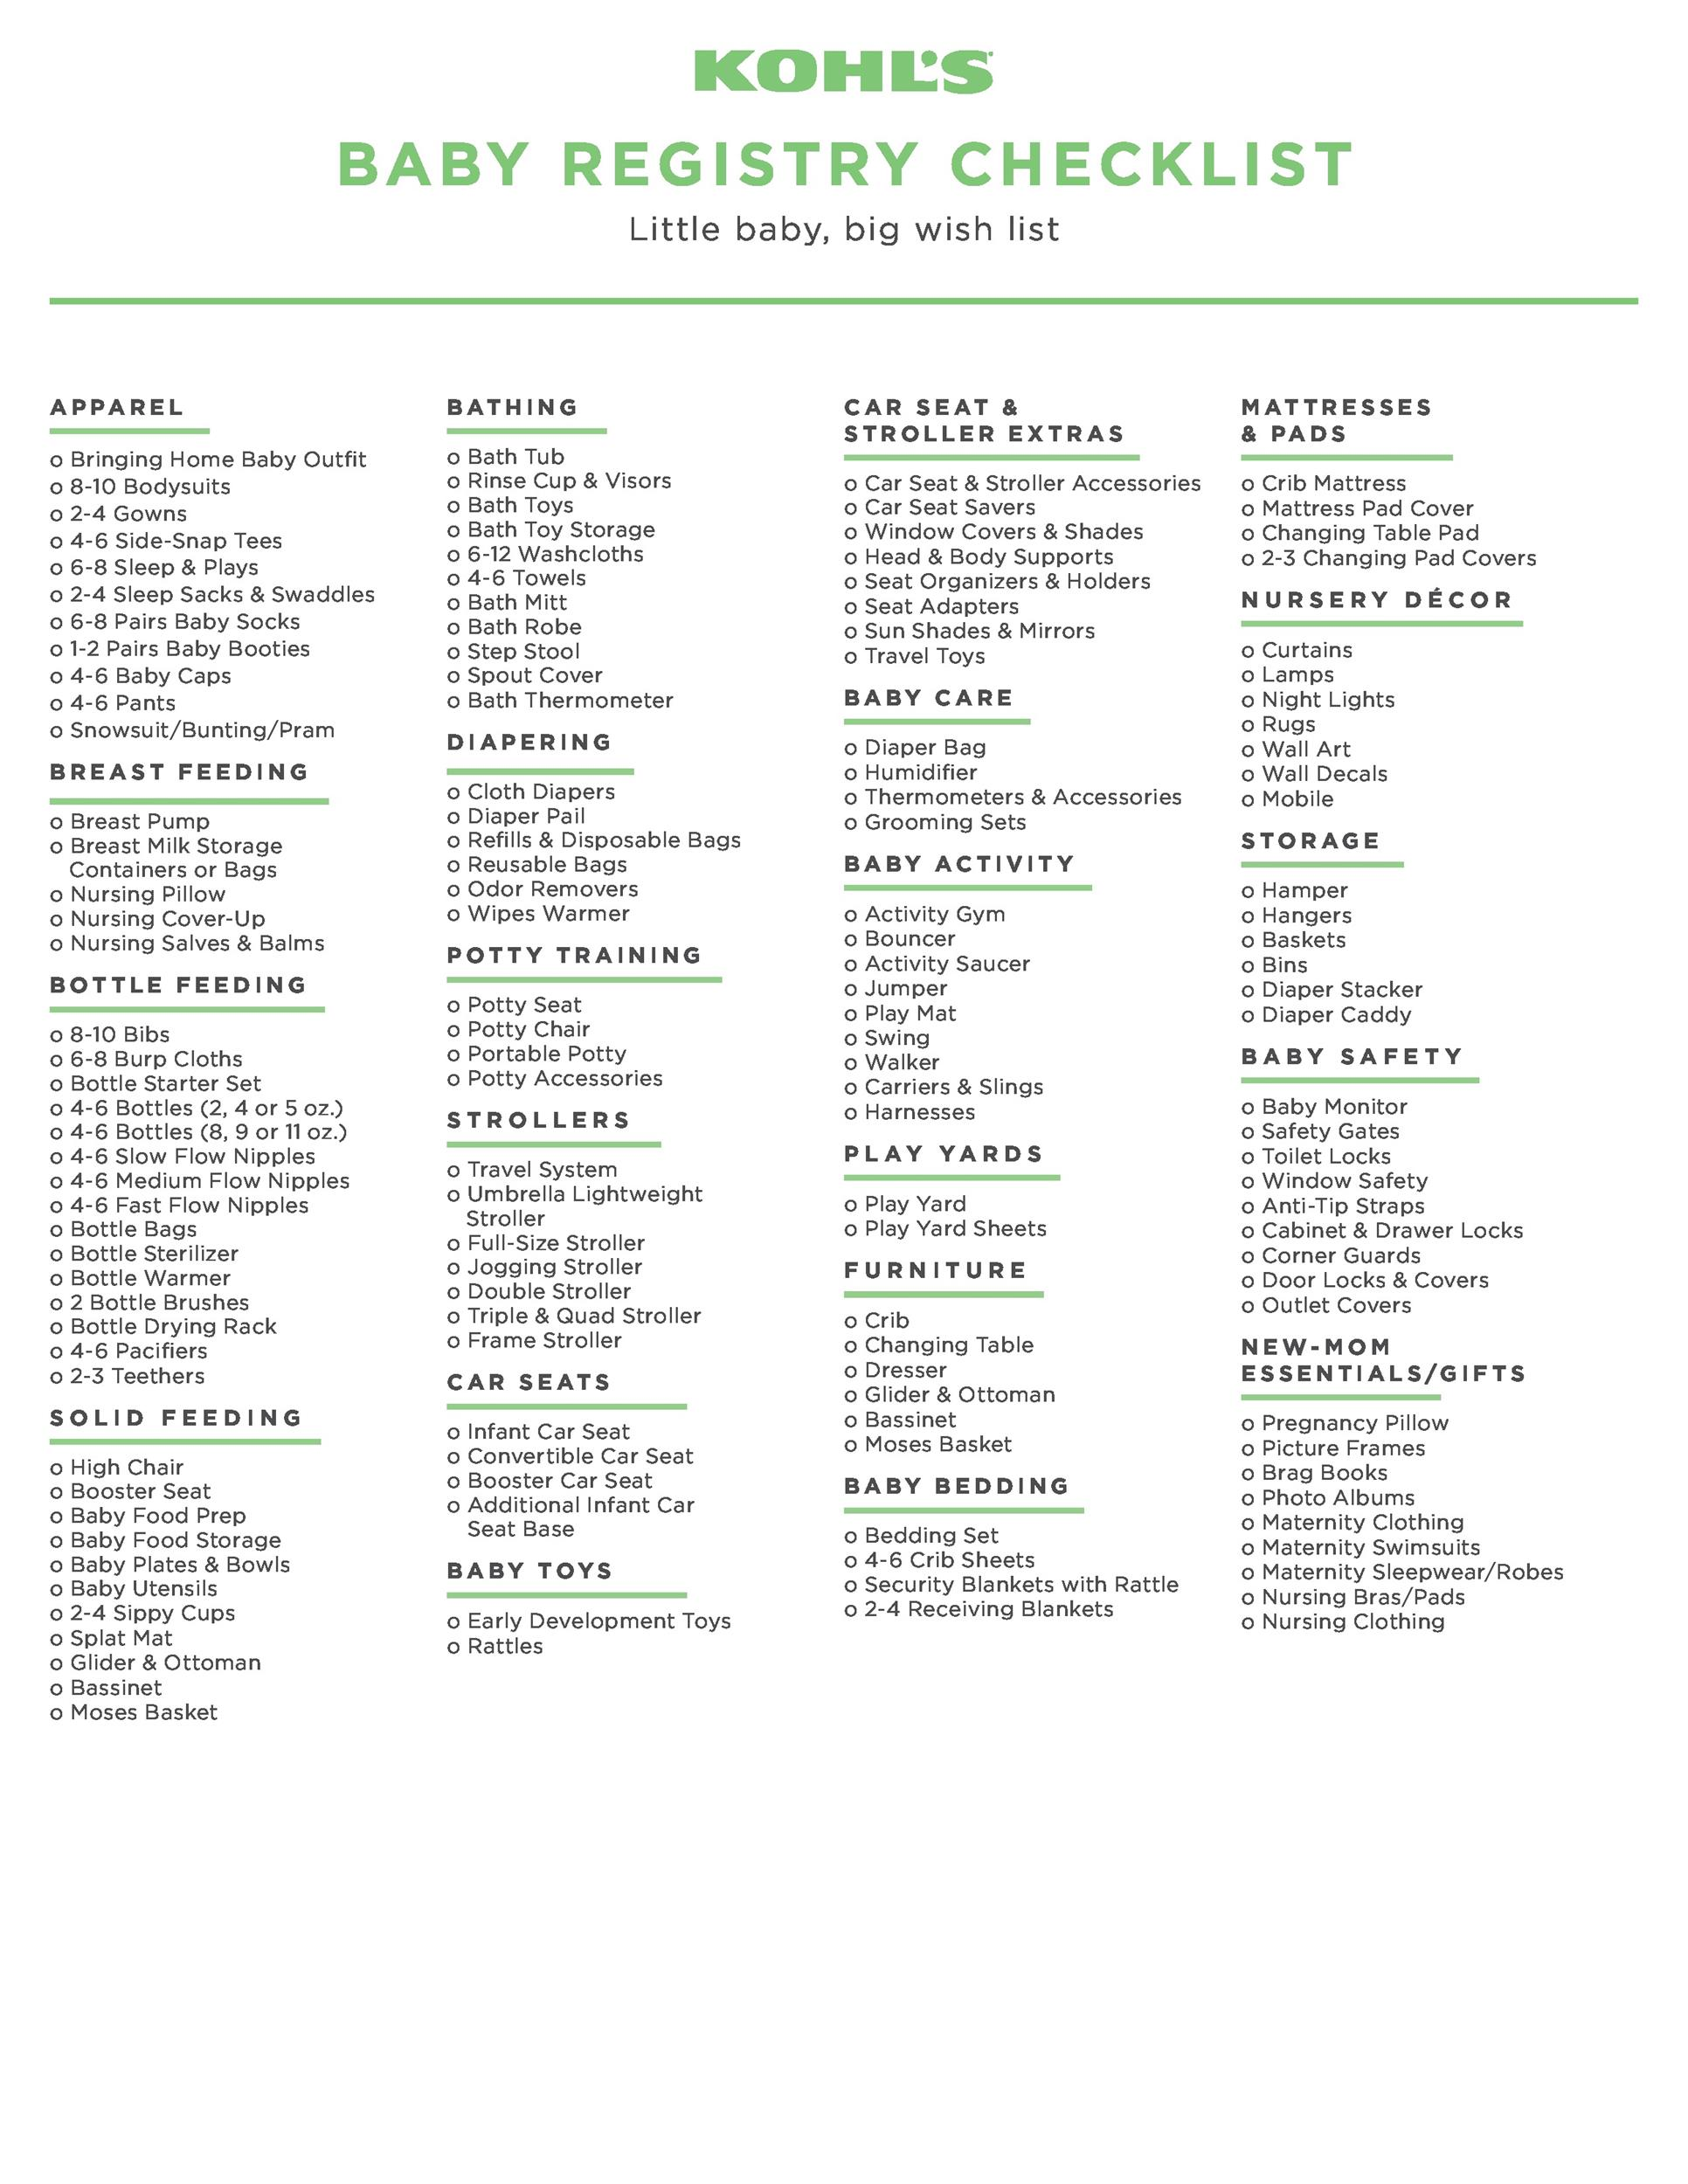 Free Baby Registry Checklist 32